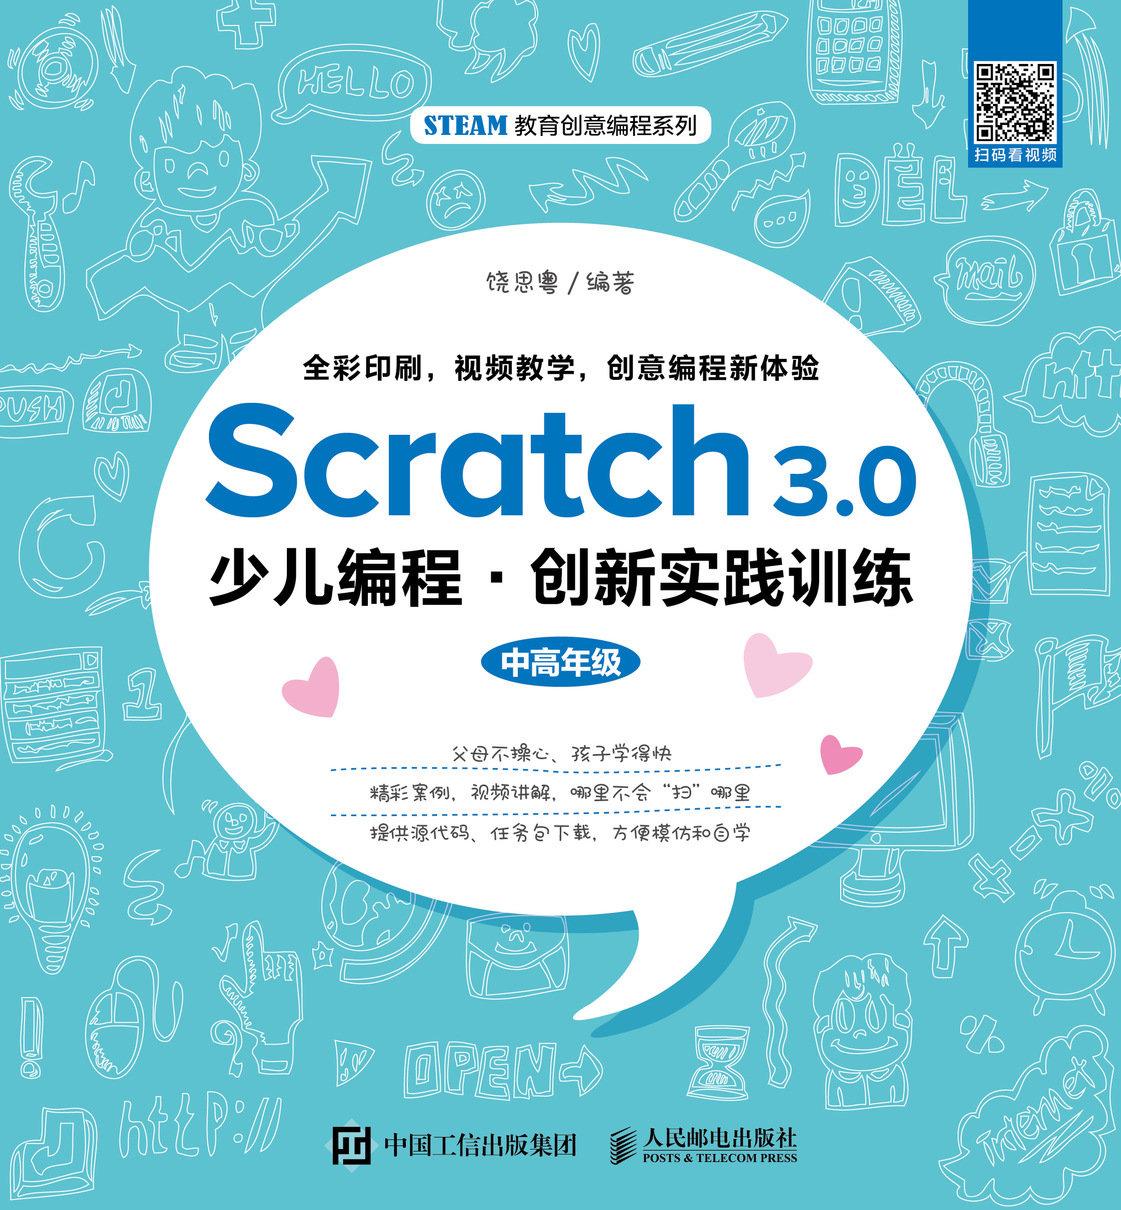 Scratch 3.0少兒編程 創新實踐訓練-preview-1